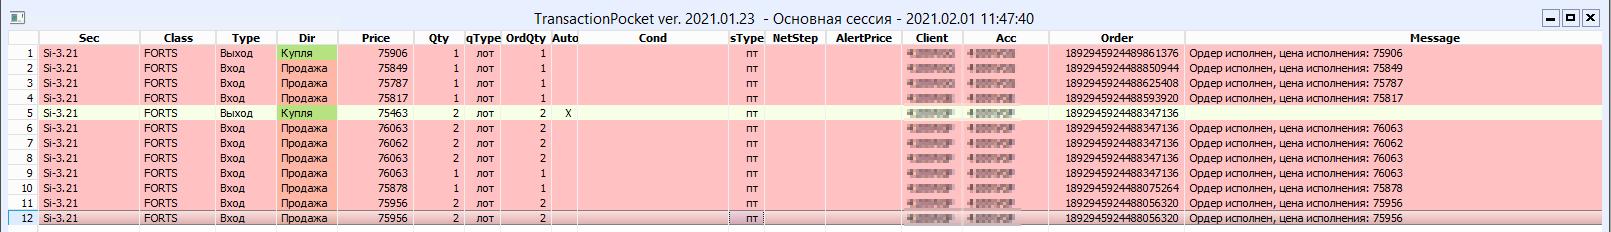 Карман-сделок-transactionPocket-окно-скрипта